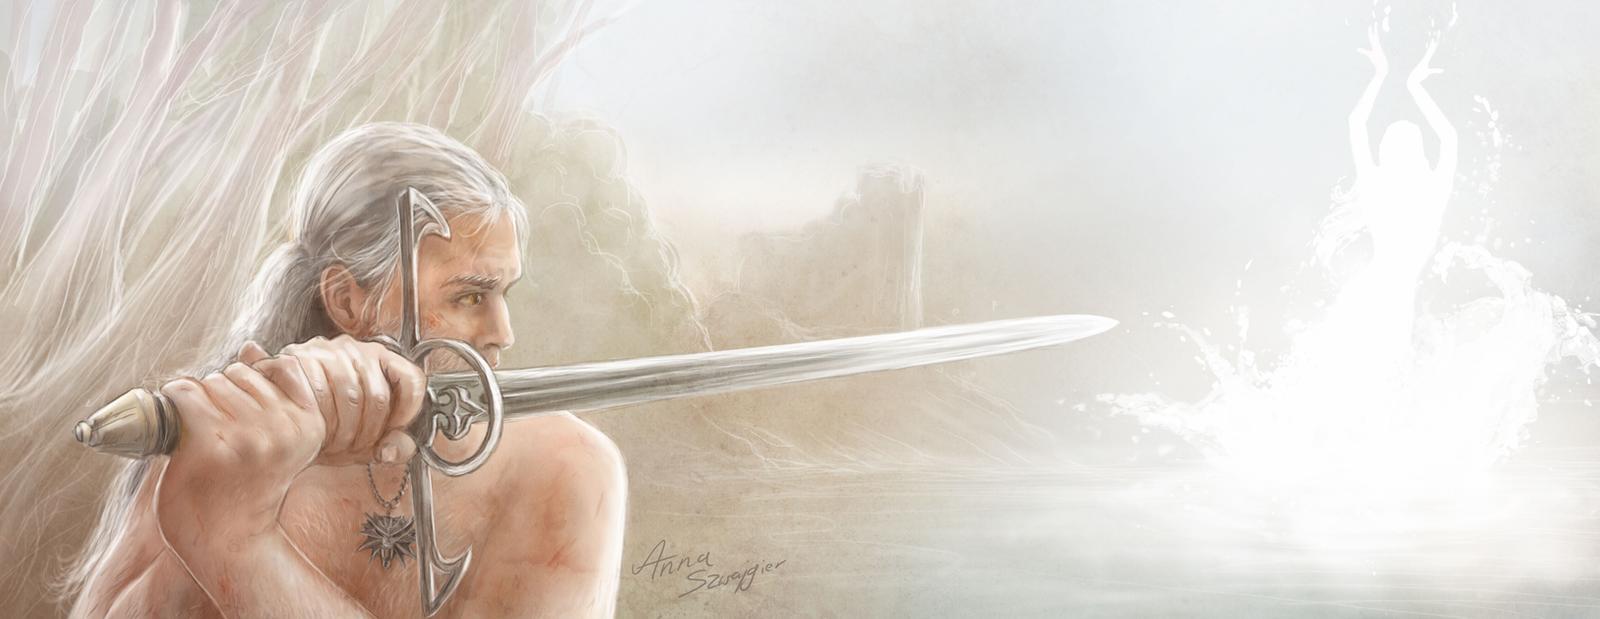 Геральт - The Witcher 3: Wild Hunt